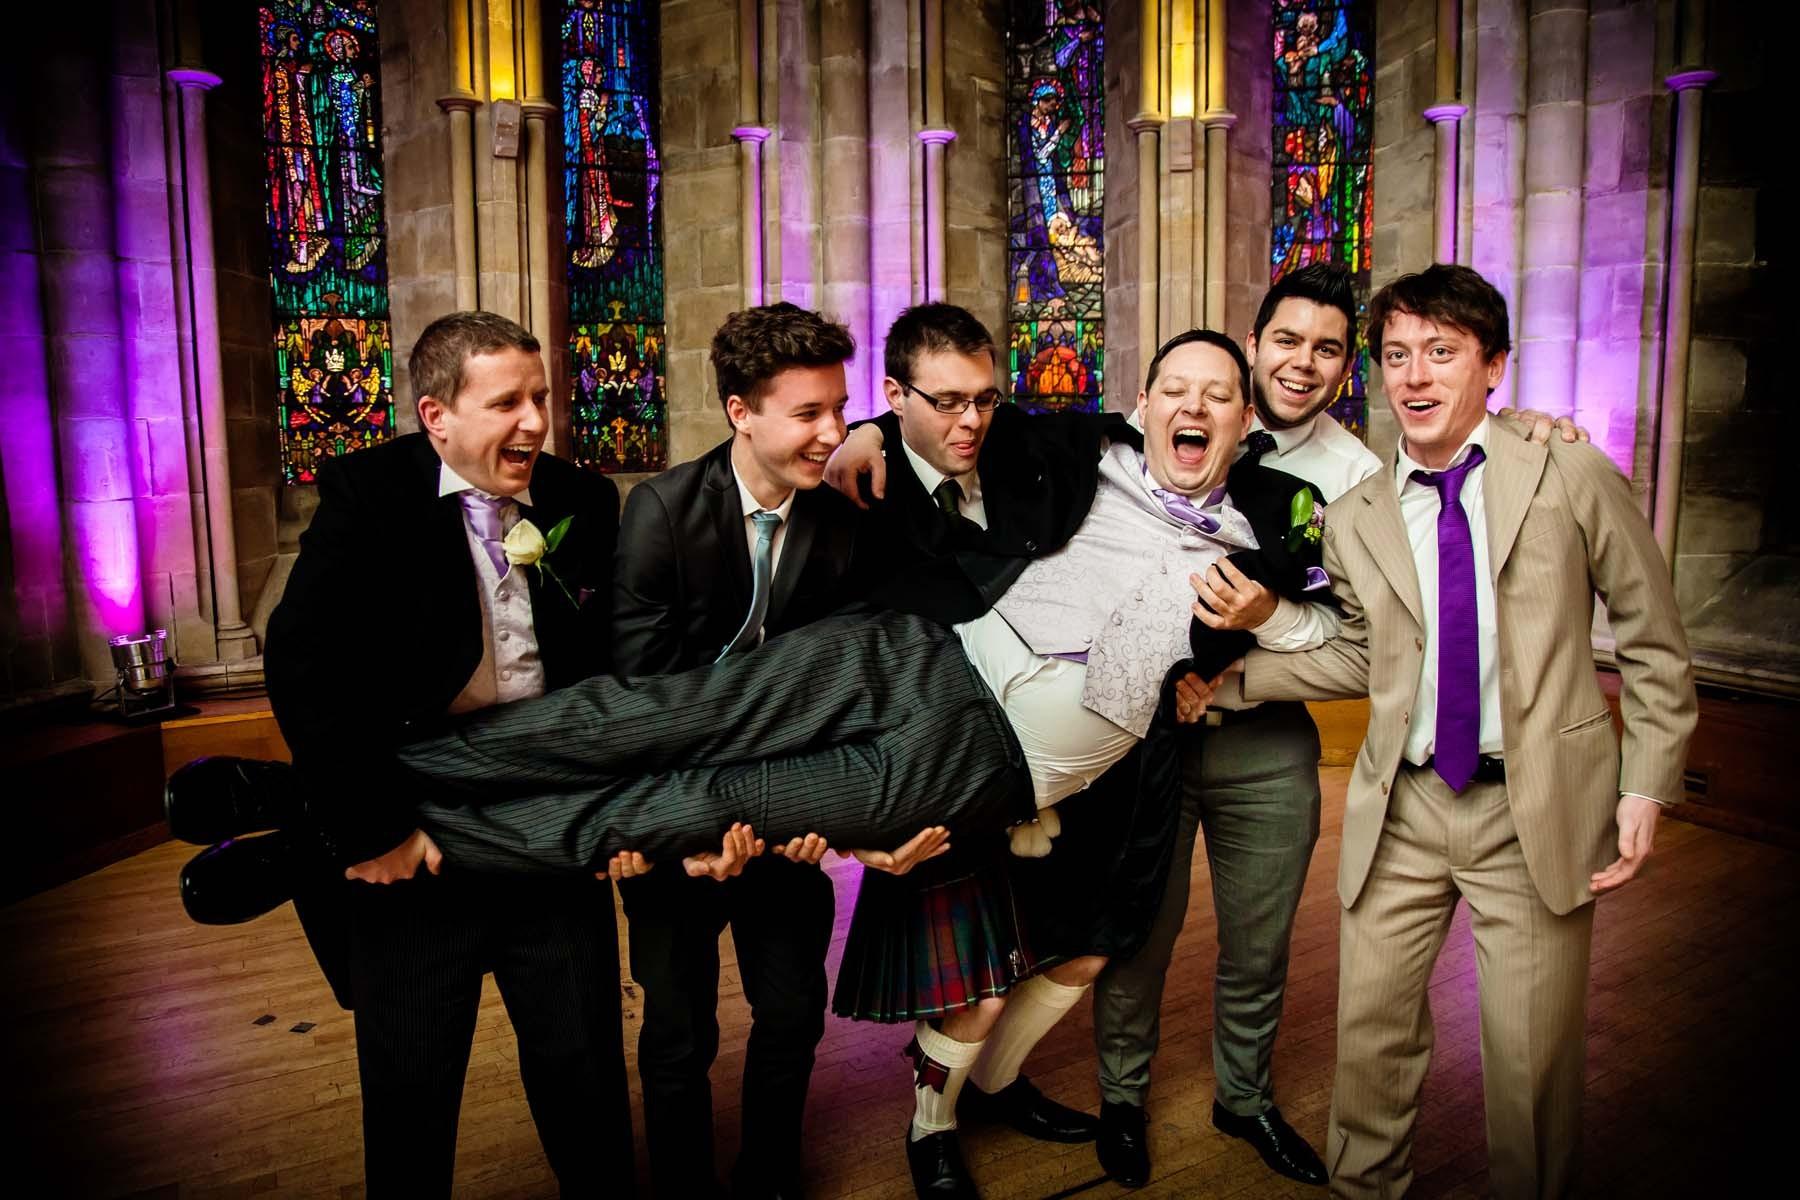 Sussex & Surrey Wedding Photographer - Guests & Groups (13)